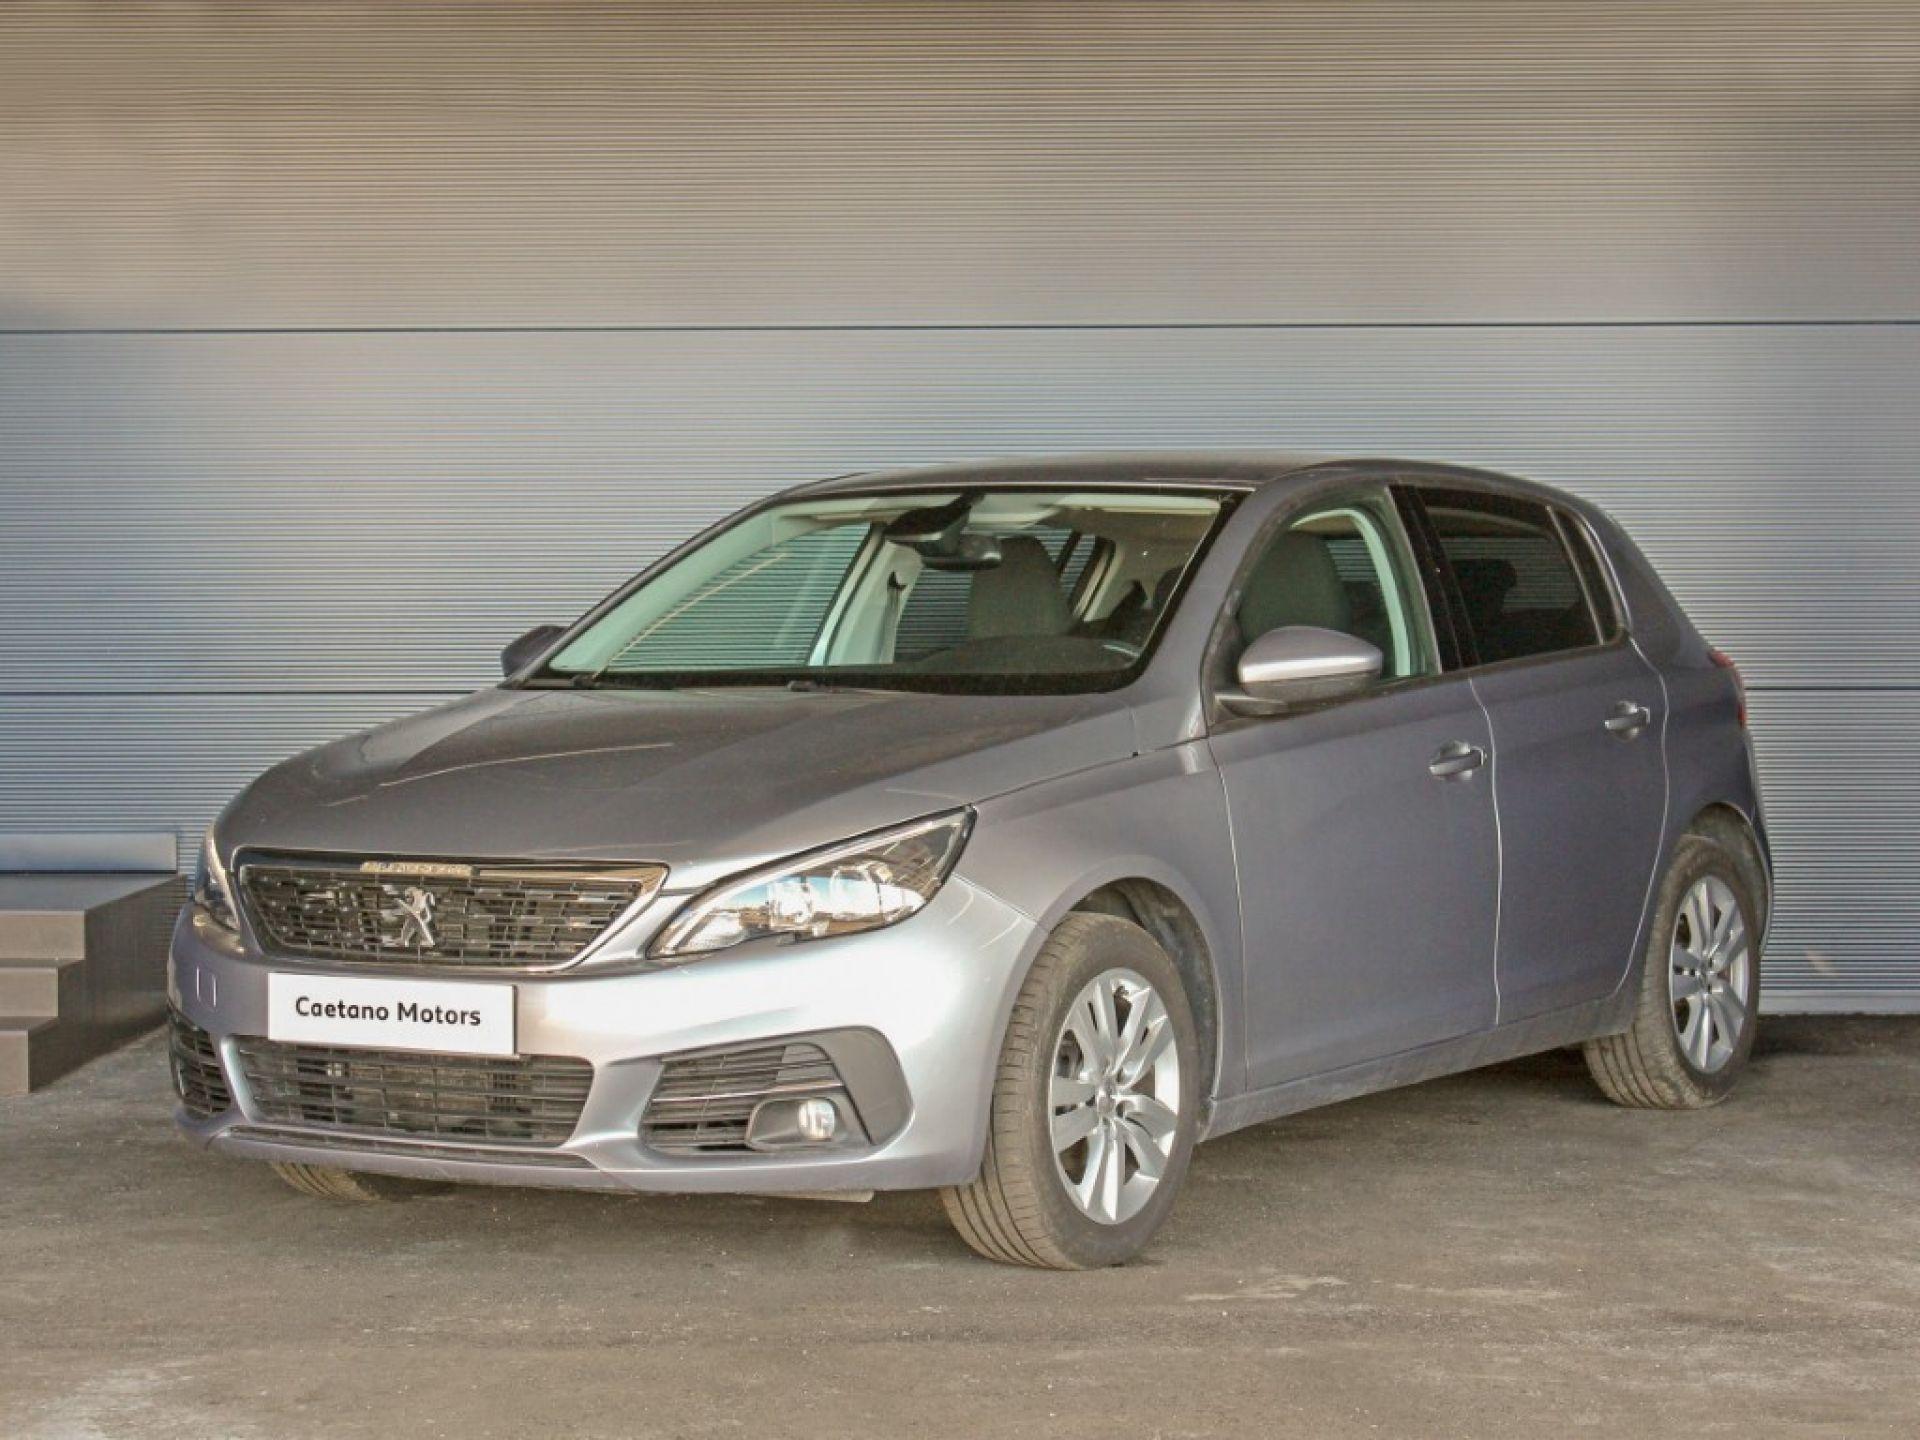 Peugeot 308 Active 1.6 BlueHDi 100cv CVM5 usada Porto